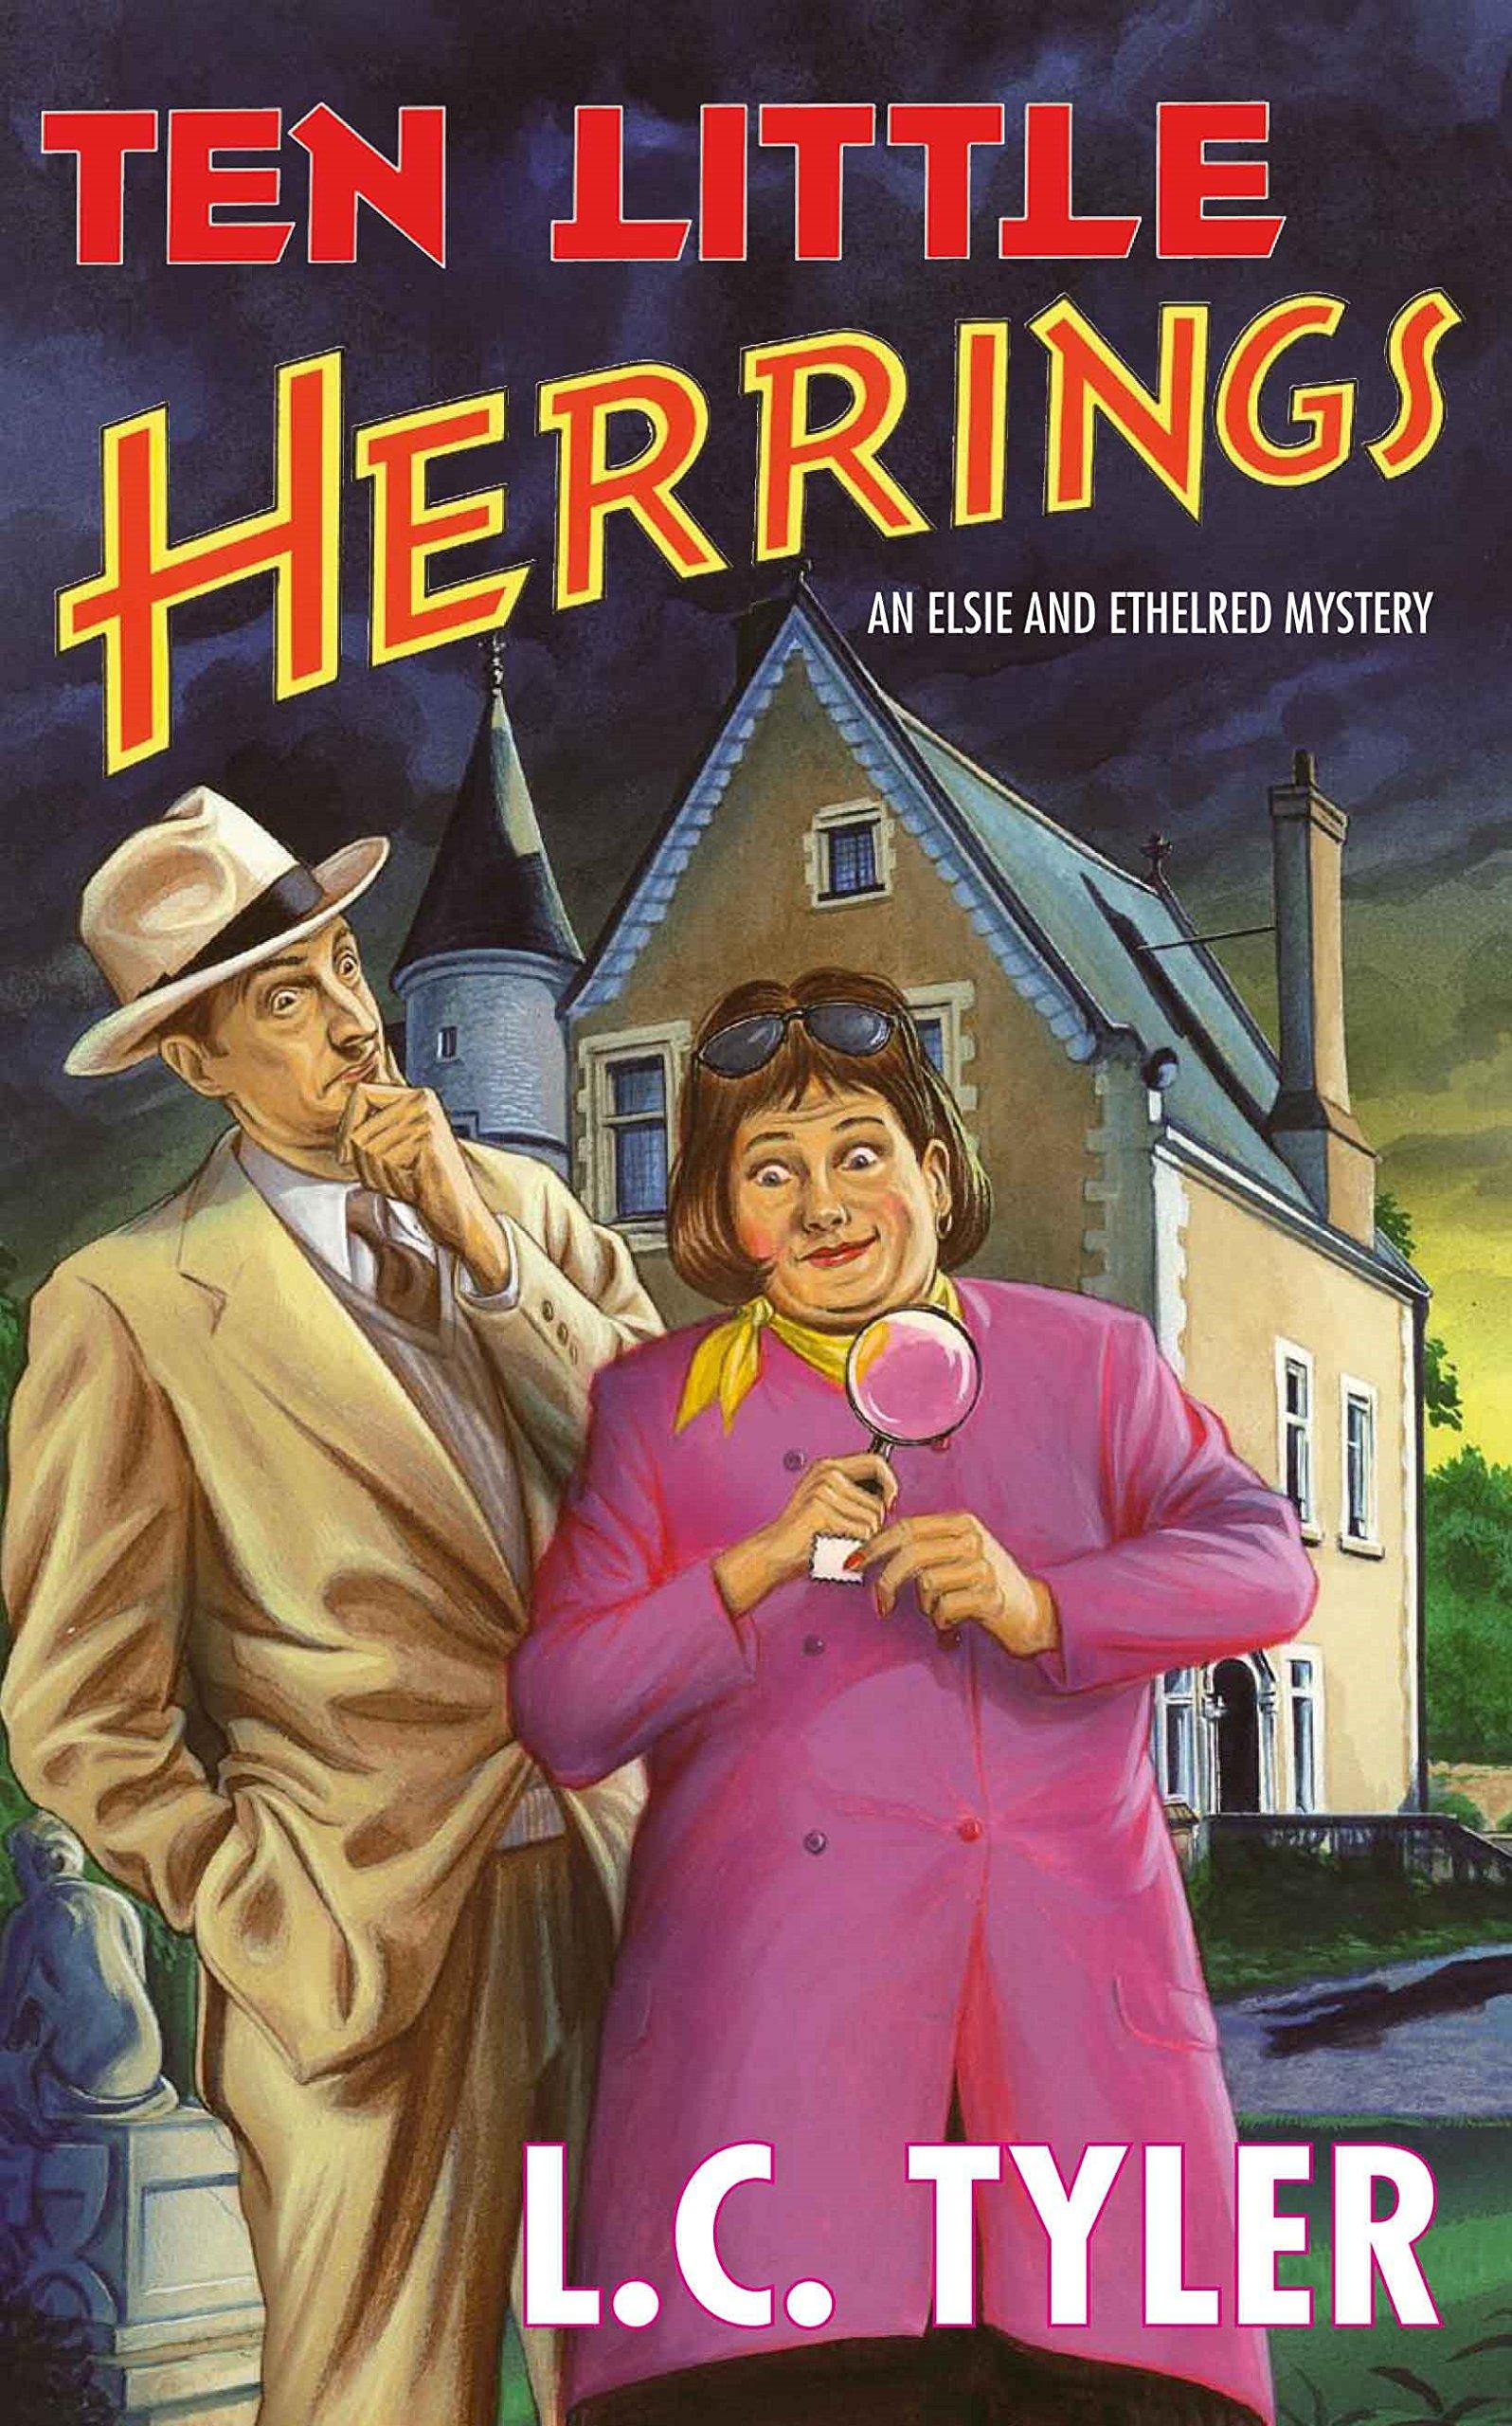 Ten Little Herrings: Amazon.co.uk: L. C. Tyler: 9780230714670: Books